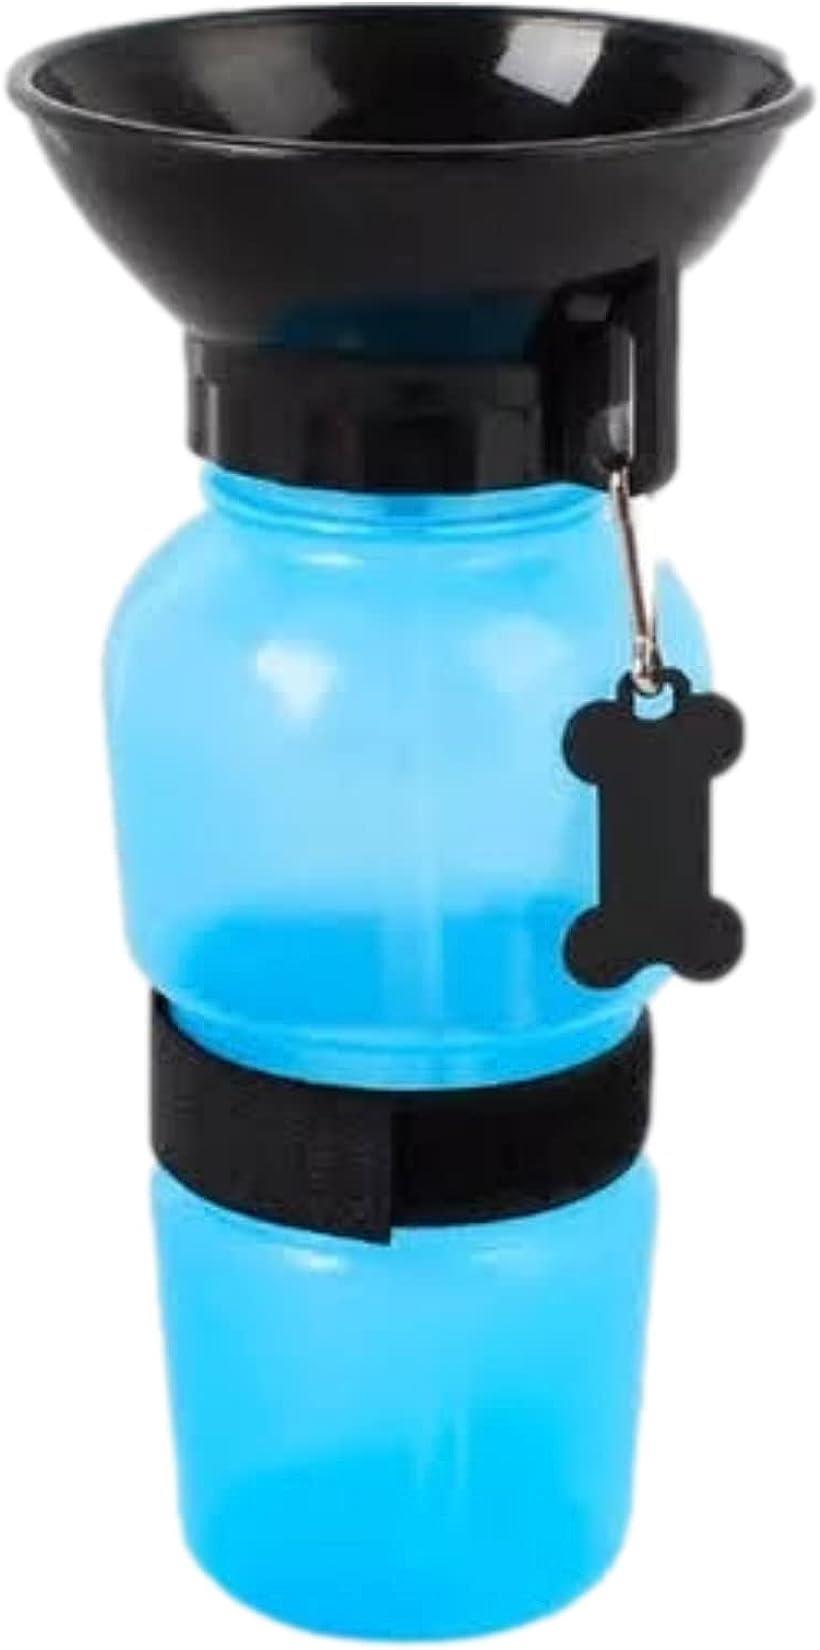 TOMMYFIELD 給水ボトル 驚きの価格が実現 犬用 散歩 小型犬 大型犬 限定価格セール 水入れ ペットボトル ブルー